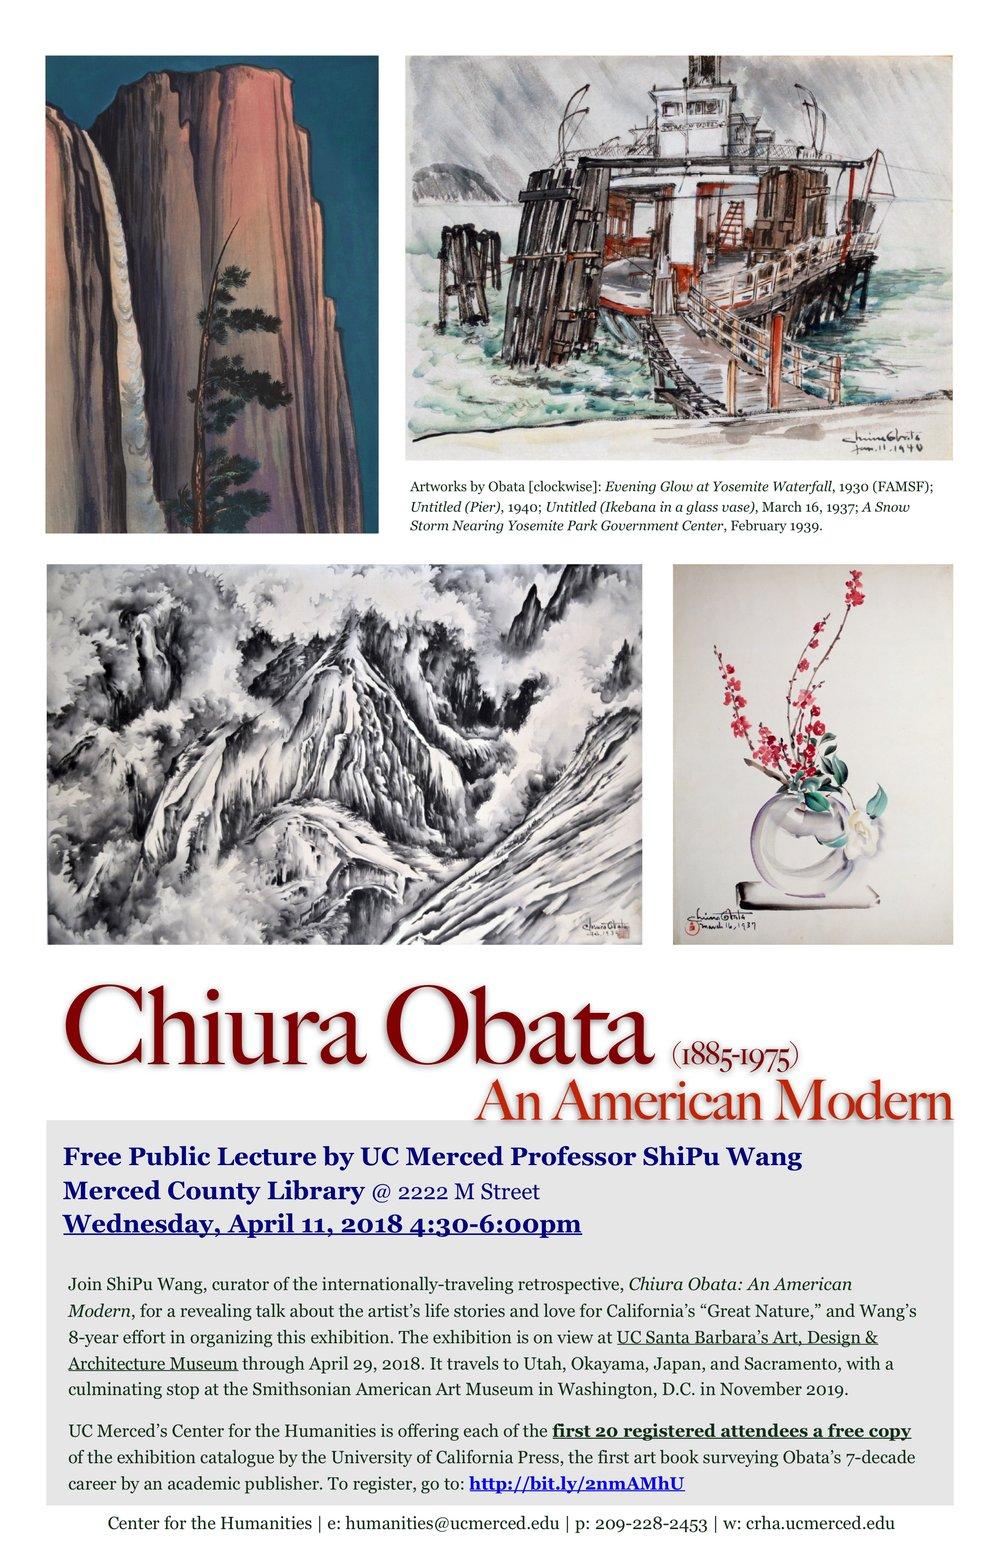 Chiura Obata (Printing).jpg